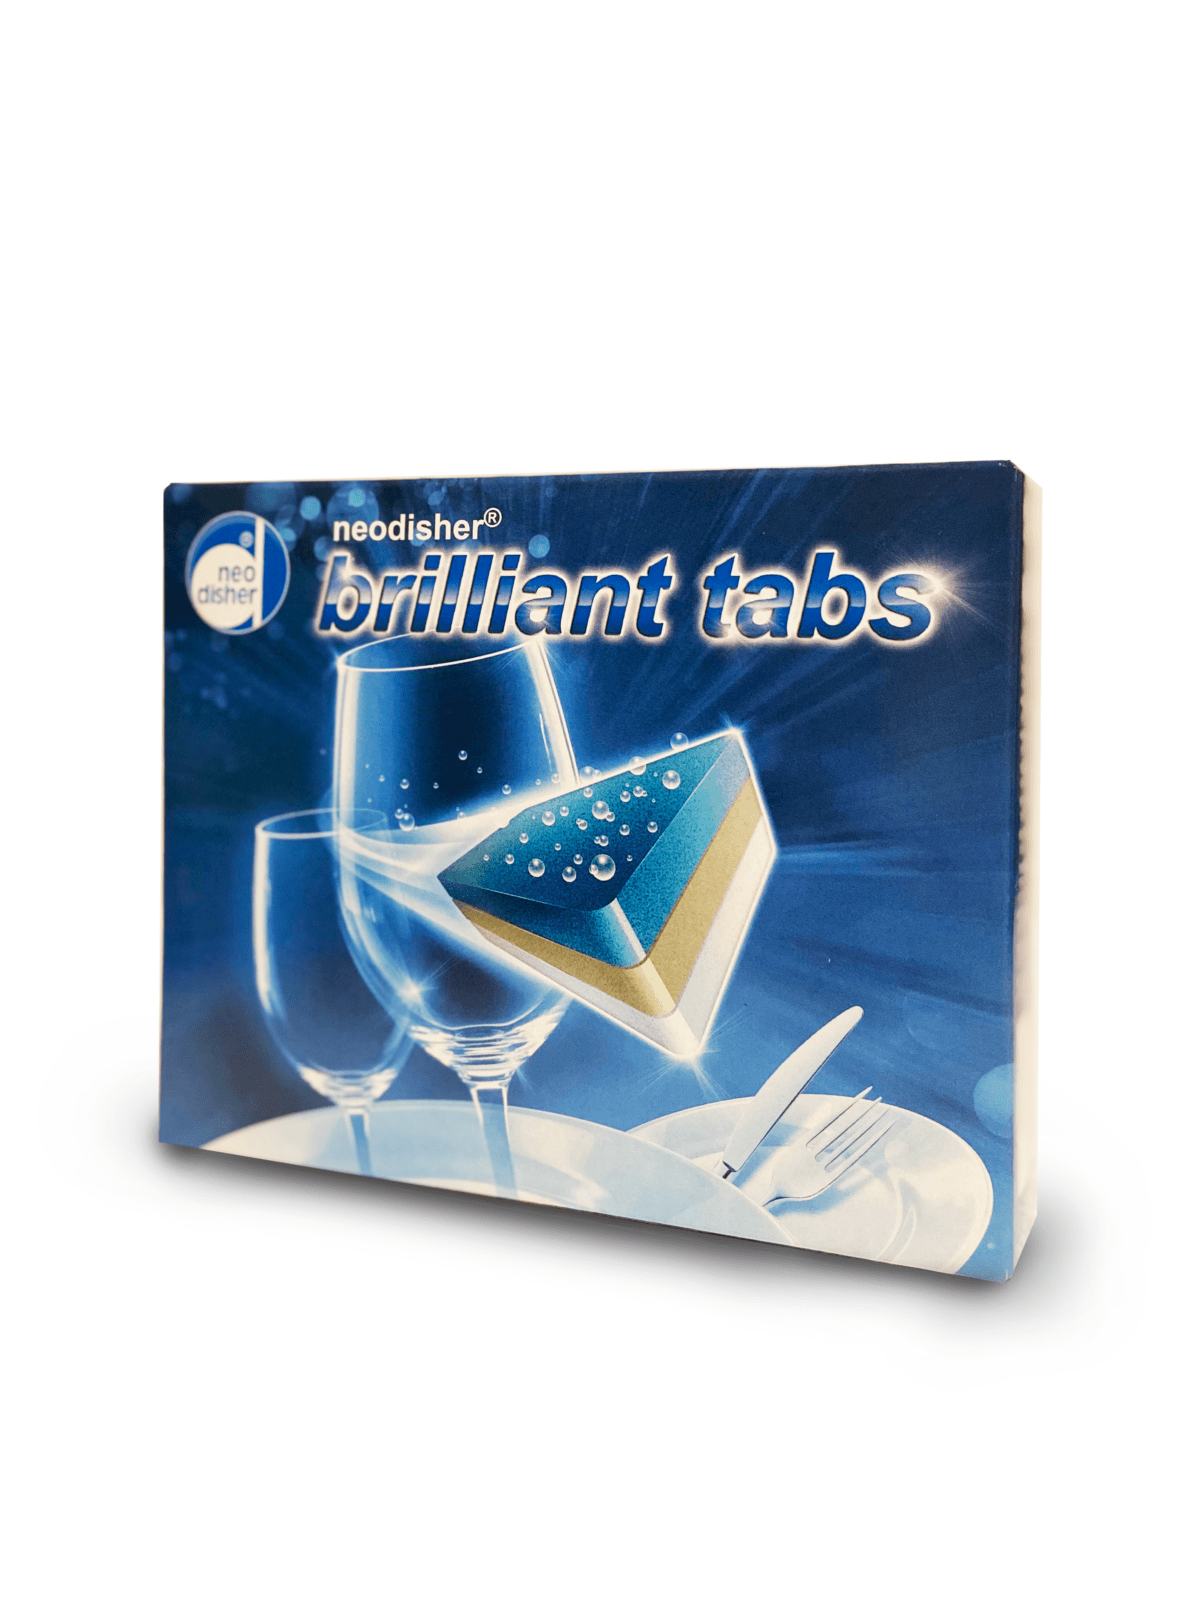 Моющее средство neodisher brilliant tabs (1.2 kg) Dr.Weigert